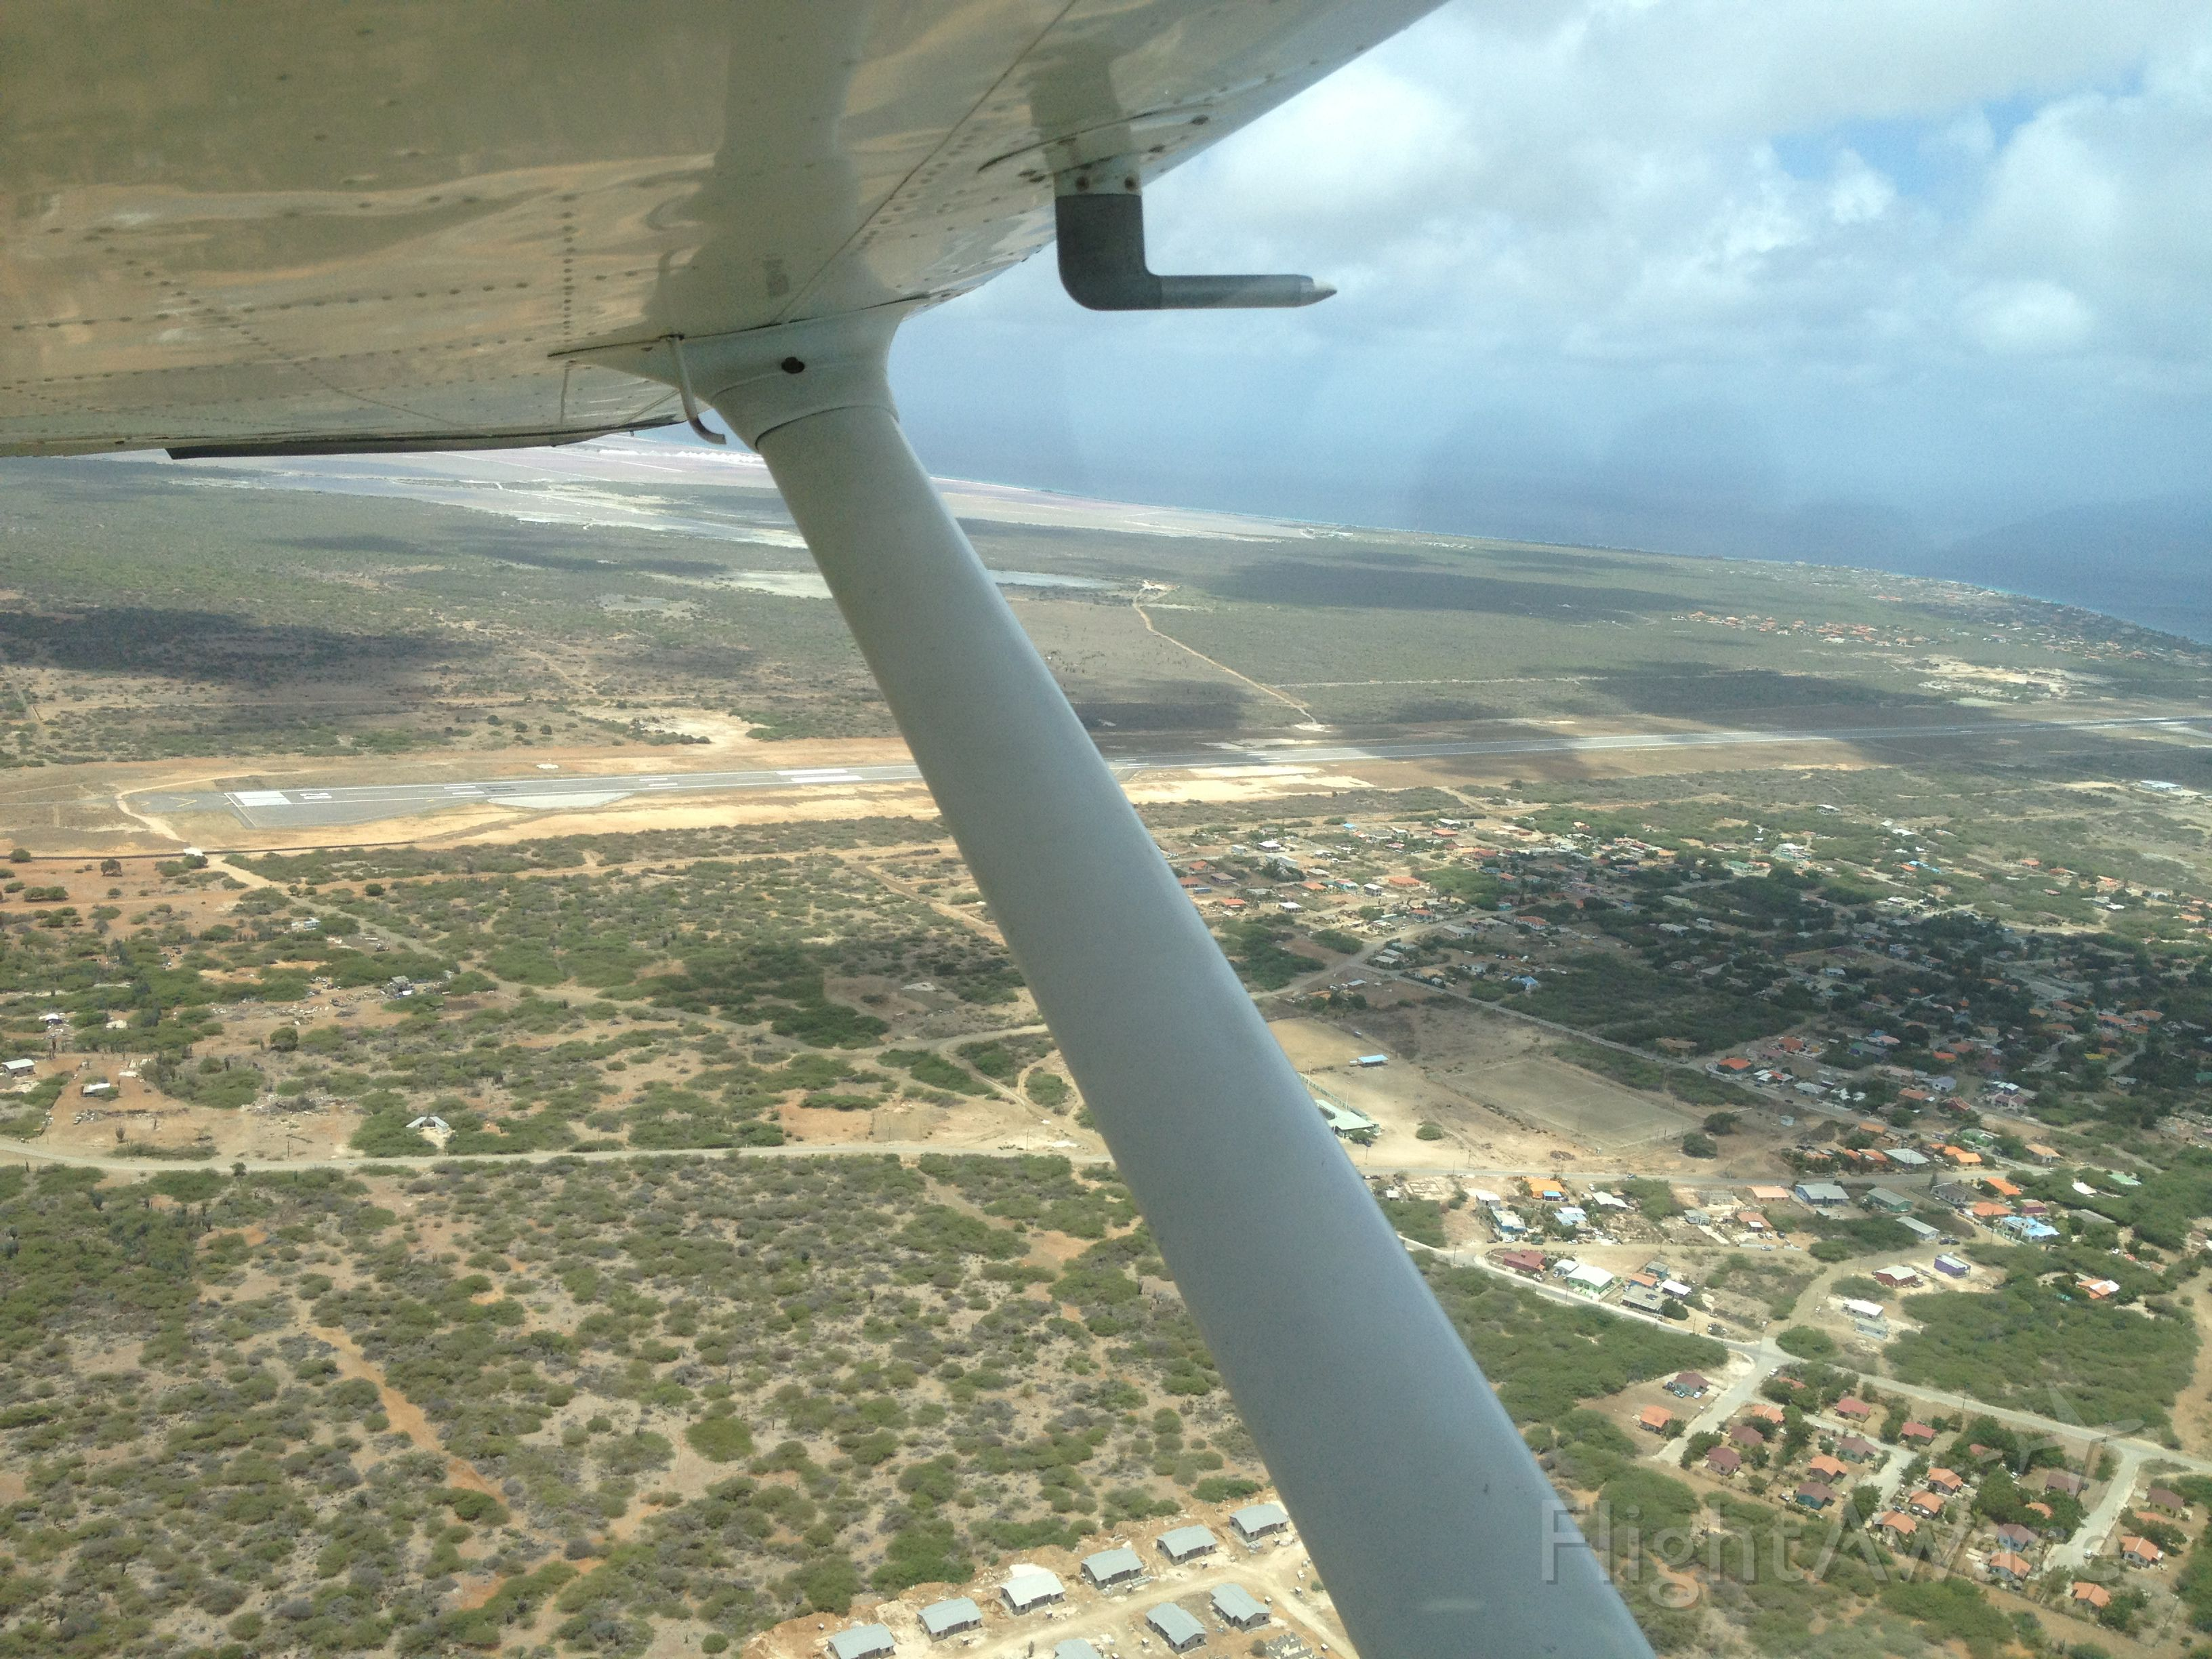 Cessna Skyhawk (N51832) - Cross Country flight from Curacao (TNCC) to Bonaire (TNCB)